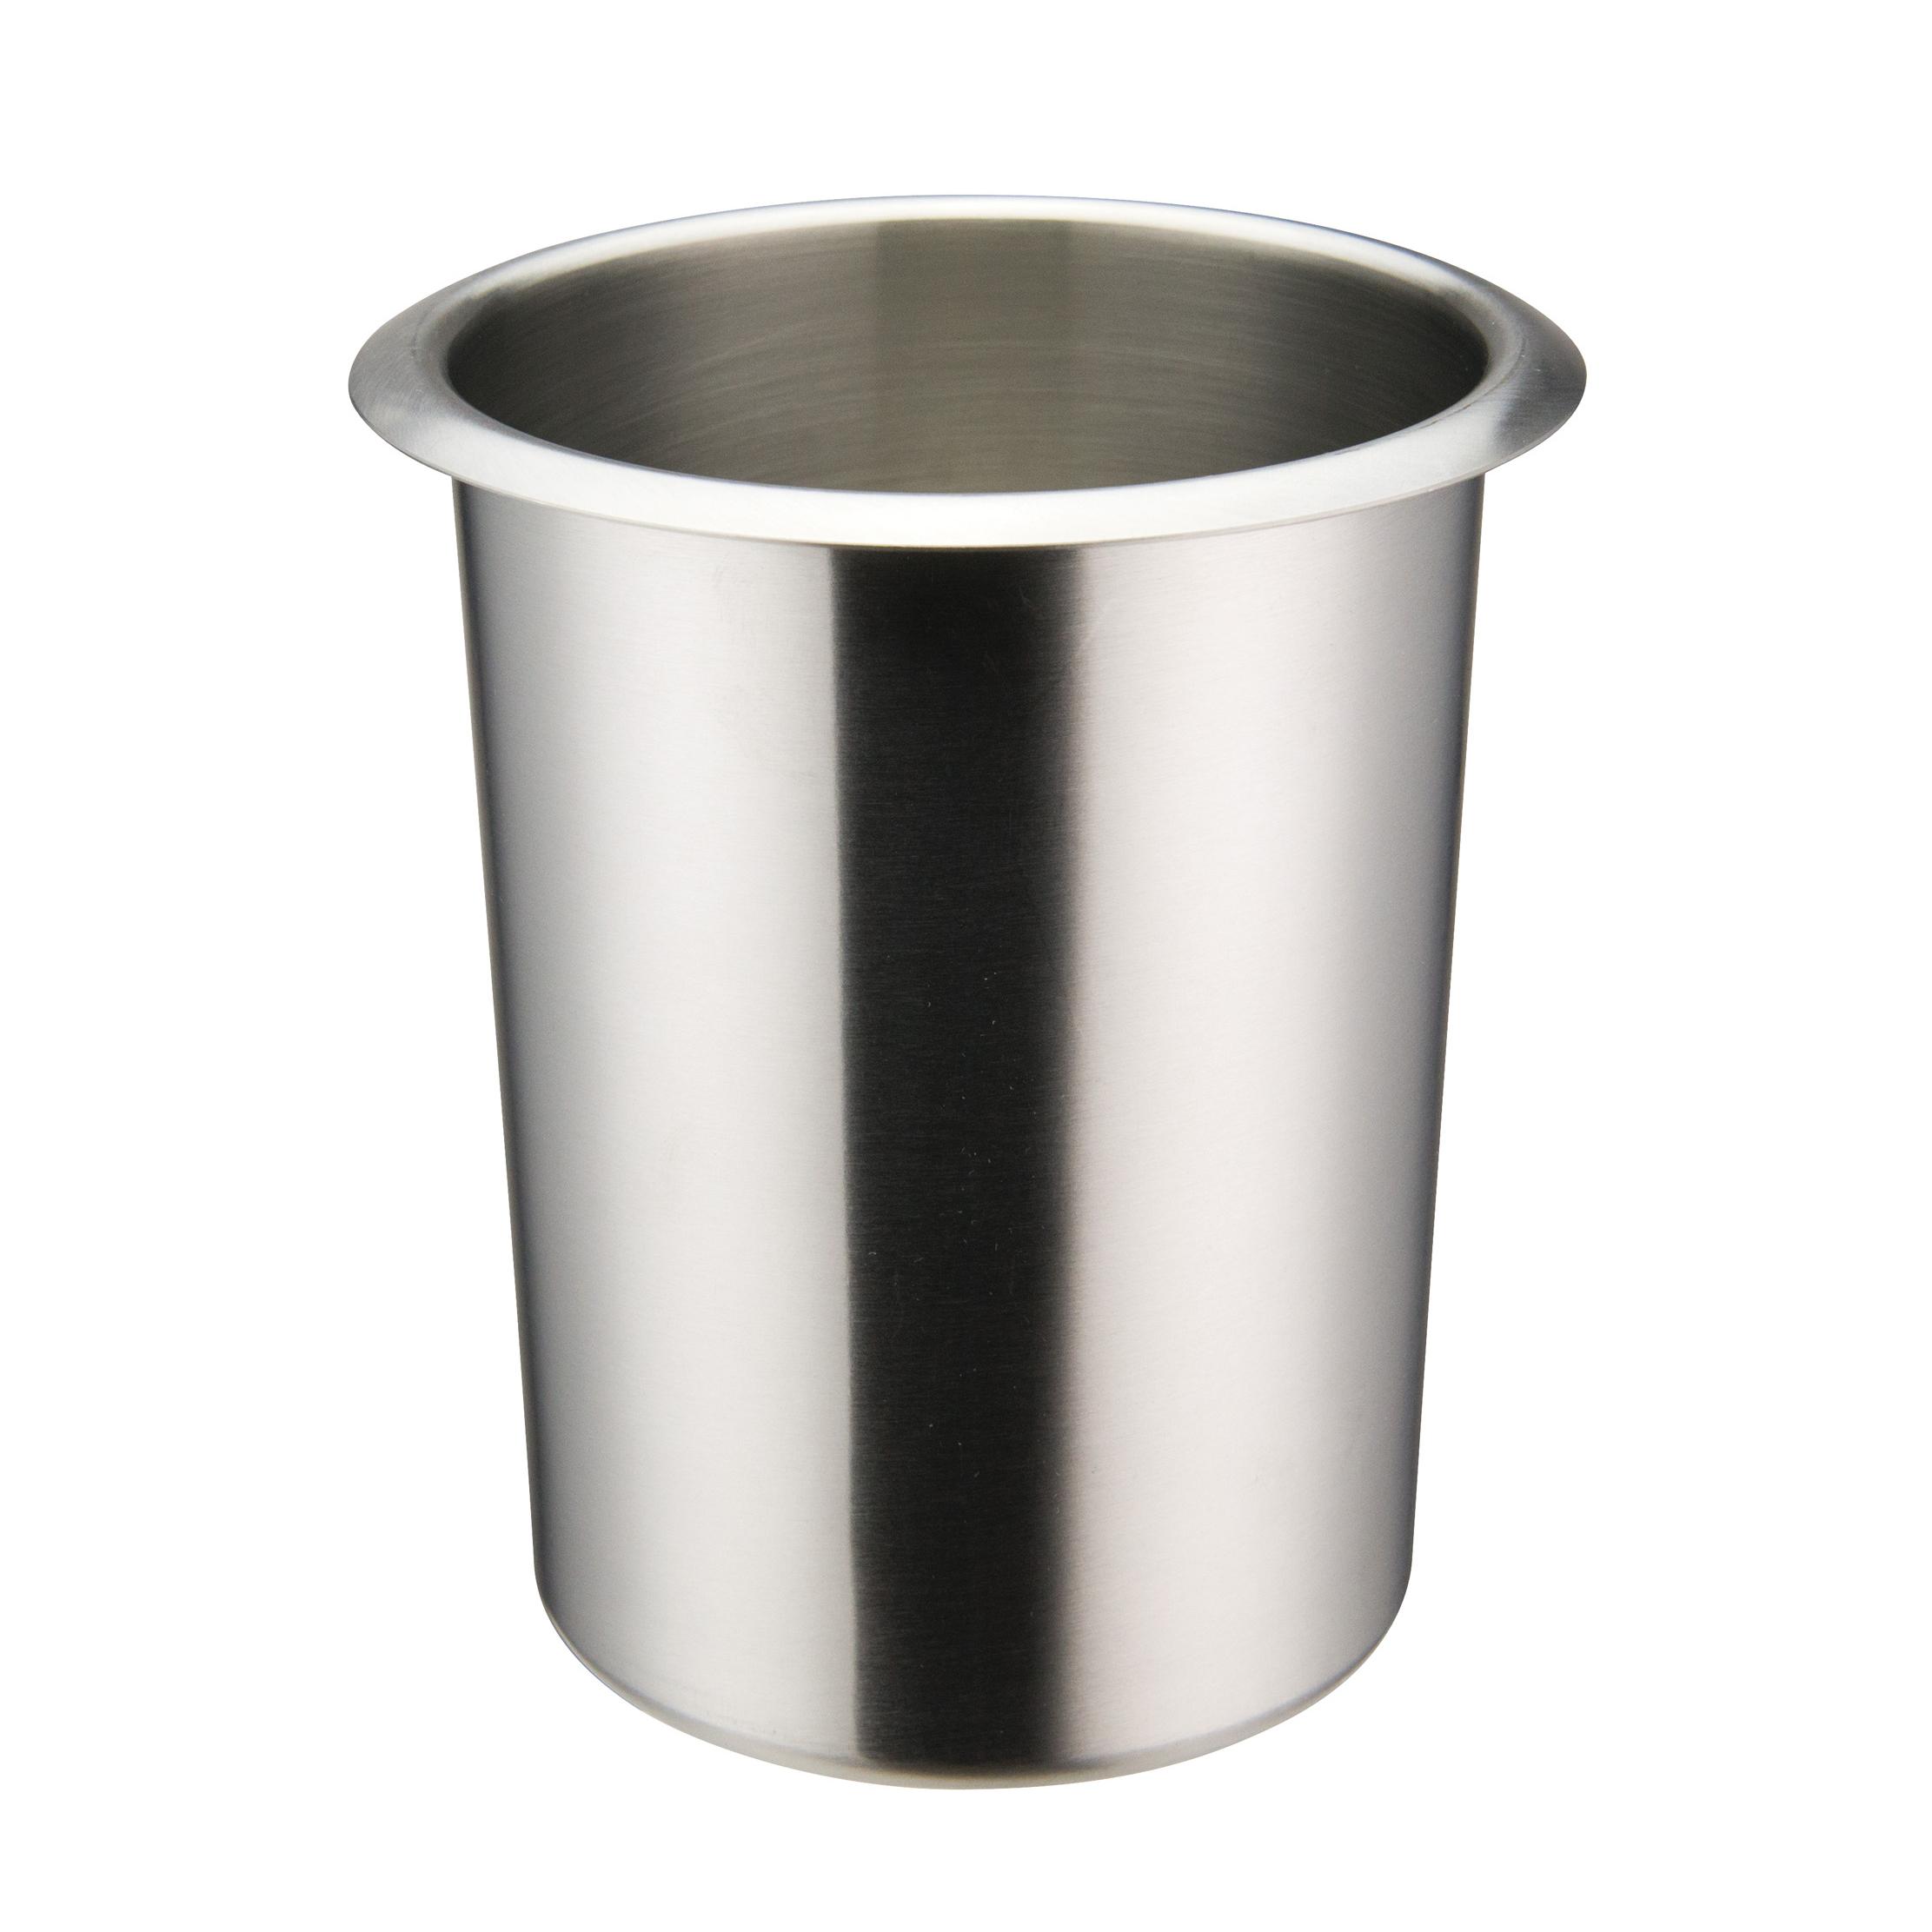 1-1/4 Qt. Stainless Steel Bain Marie, Winco BAM-1.25